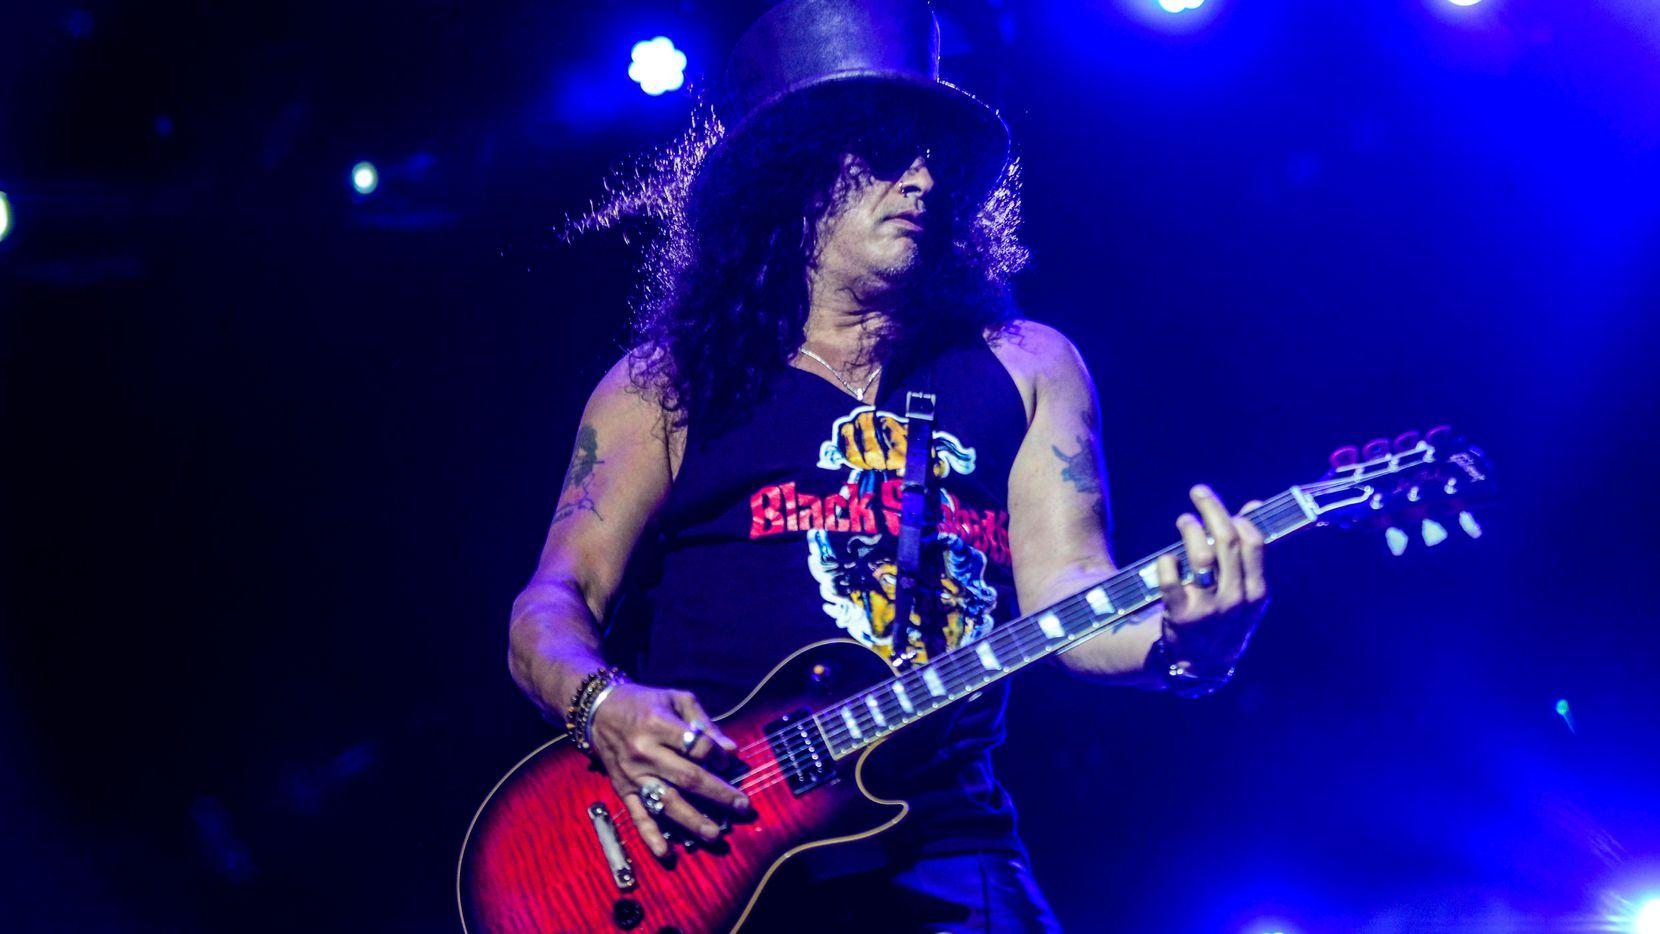 US former Guns N' Roses guitar player Slash performs in Jurere, Florianopolis, Brazil on May 22, 2019.